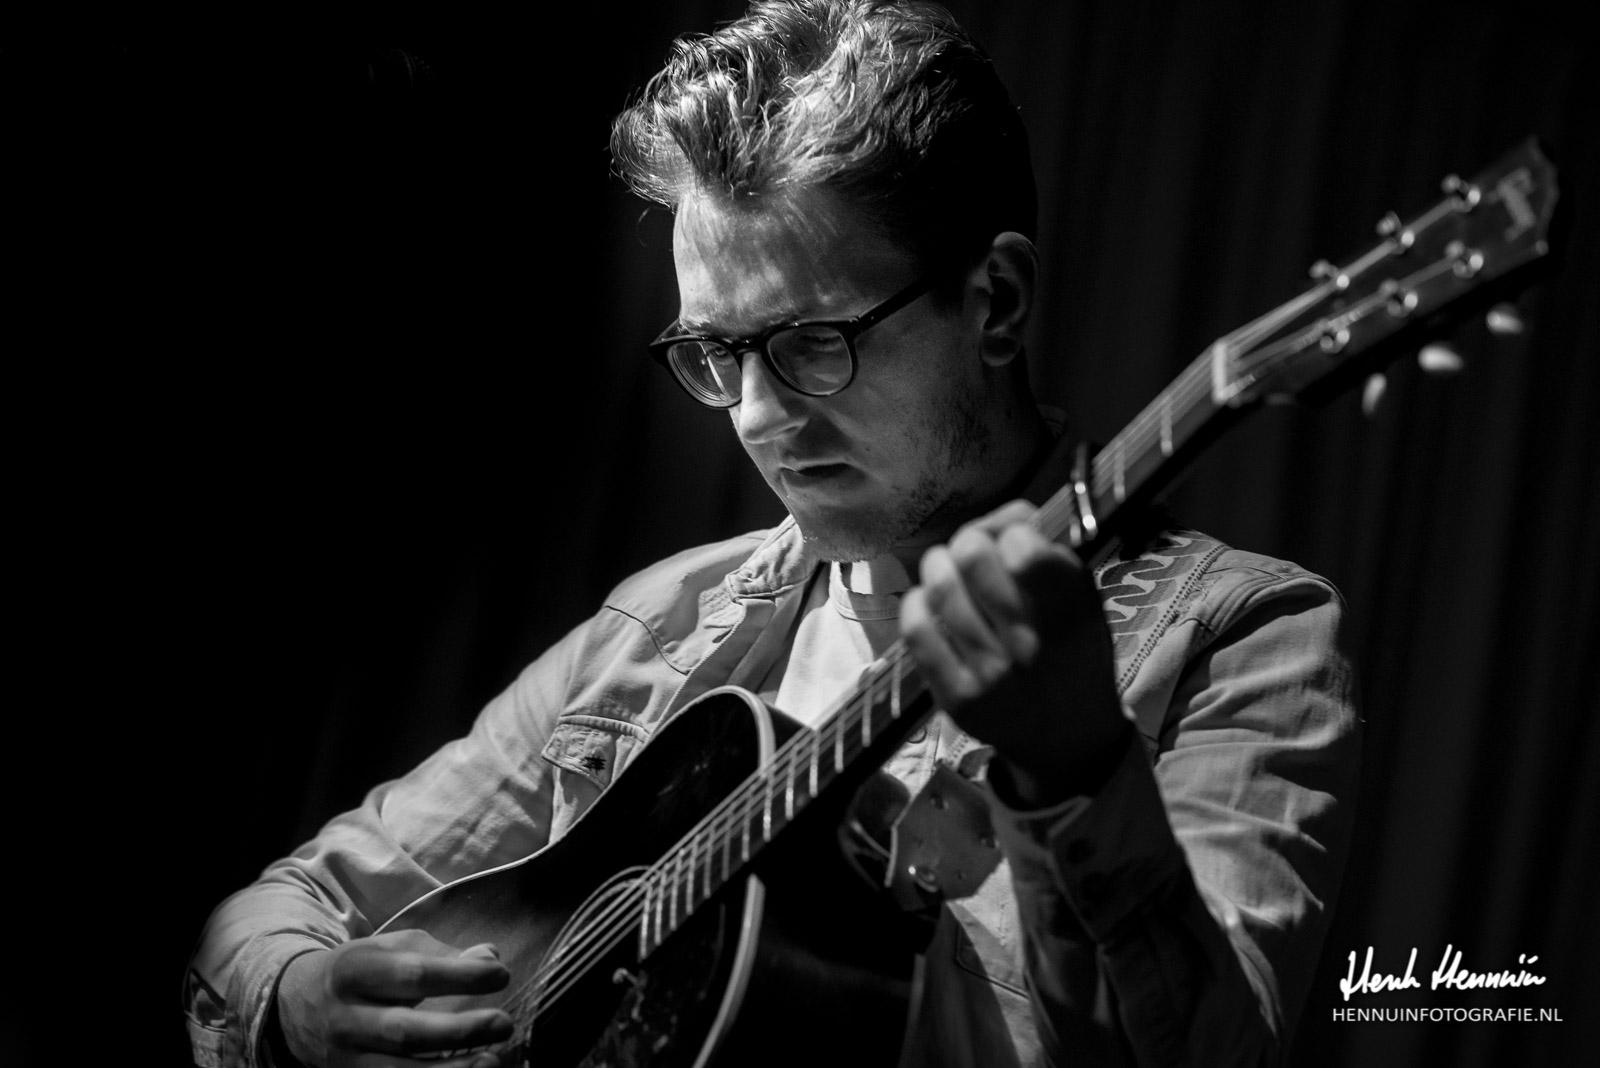 Maurice van Hoek Parelsessies Concertfoto closeup